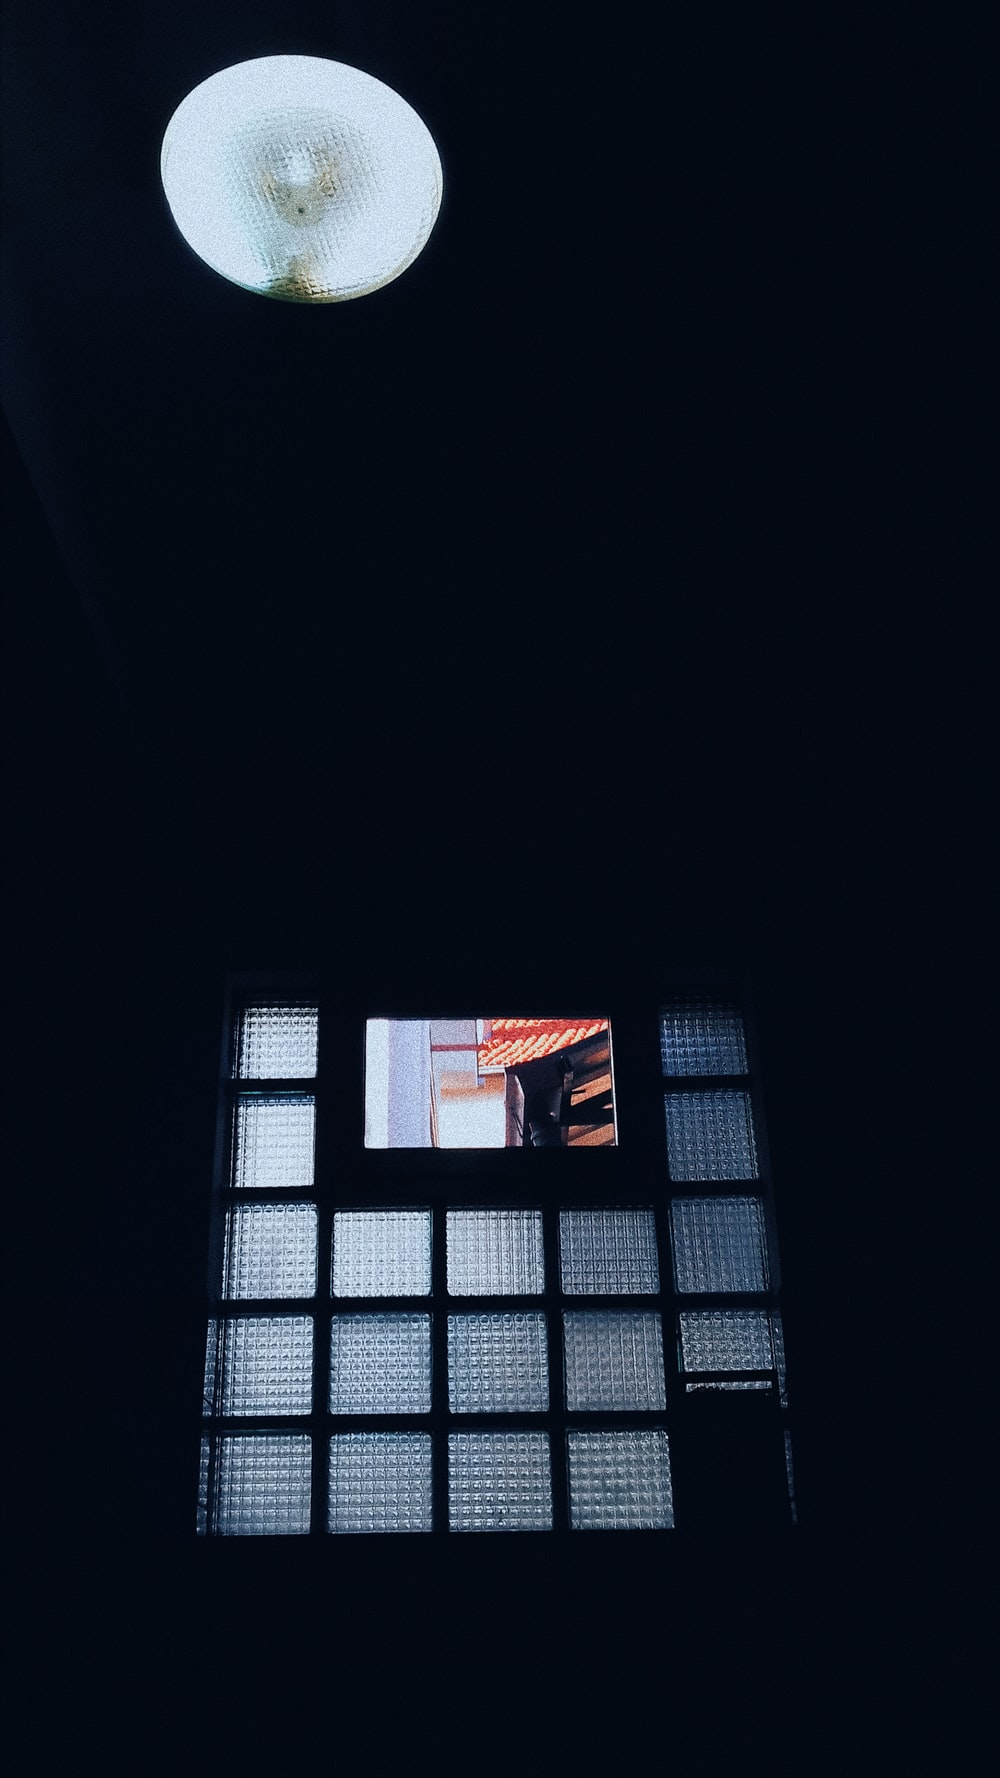 black framed glass window